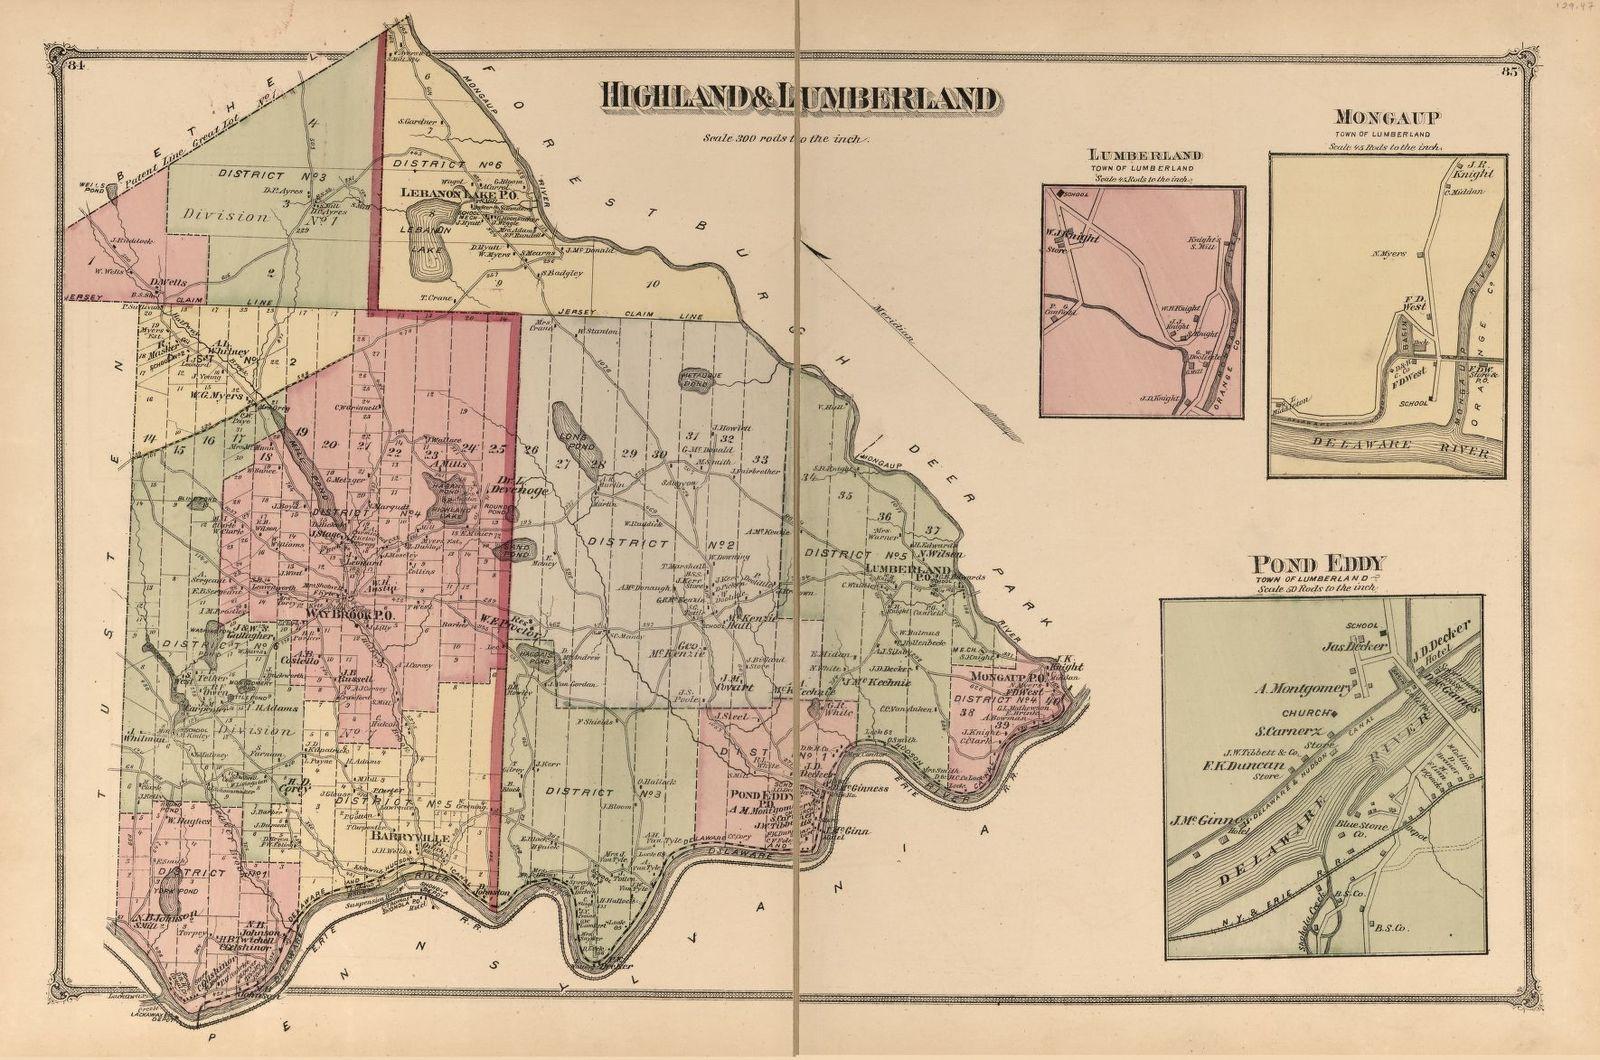 County atlas of Sullivan, New York /